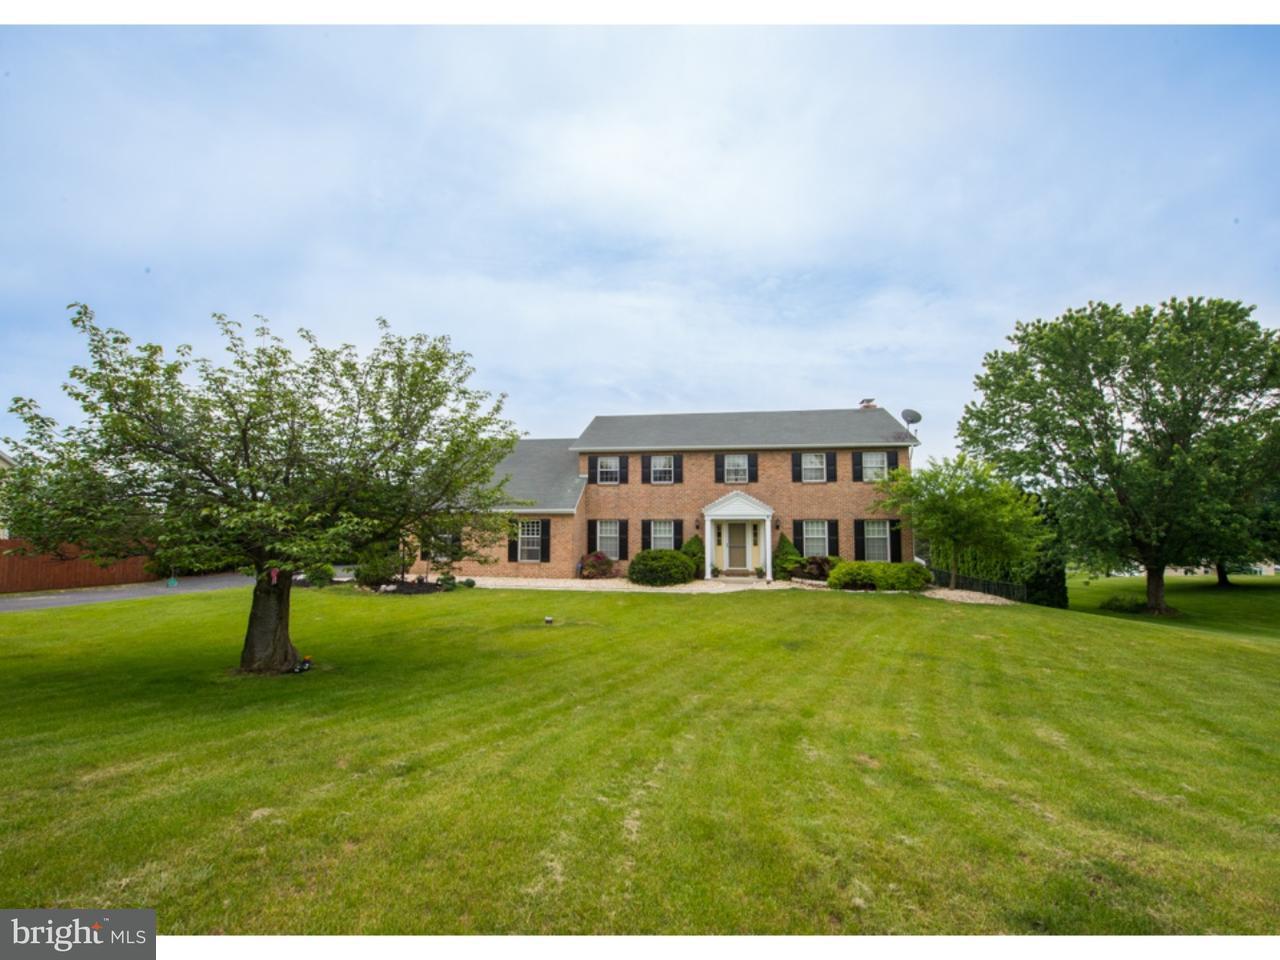 Single Family Home for Sale at 2770 BRIDLE PATH Road Slatington, Pennsylvania 18080 United States